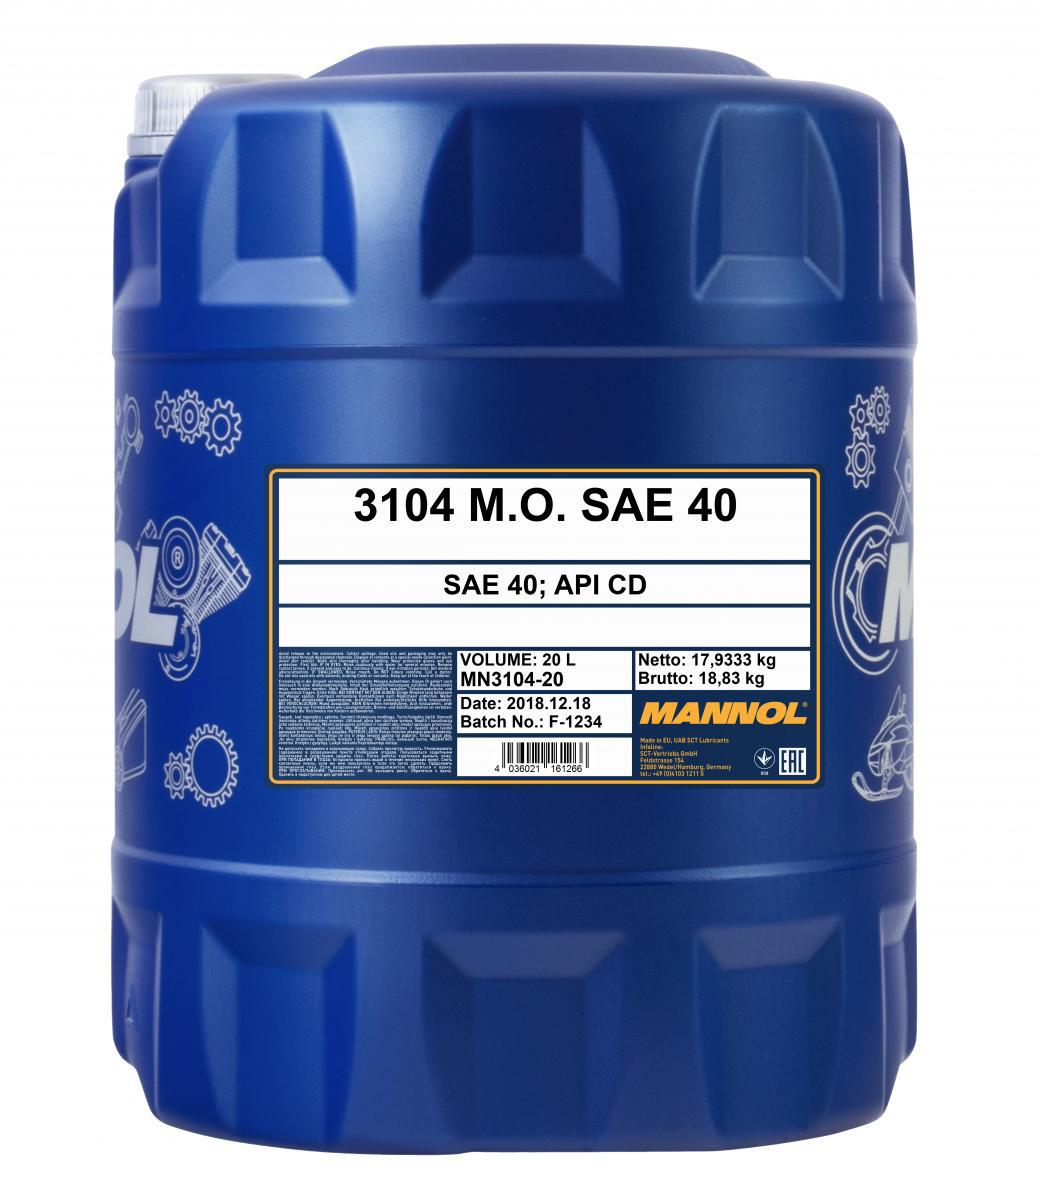 M.O. SAE 40